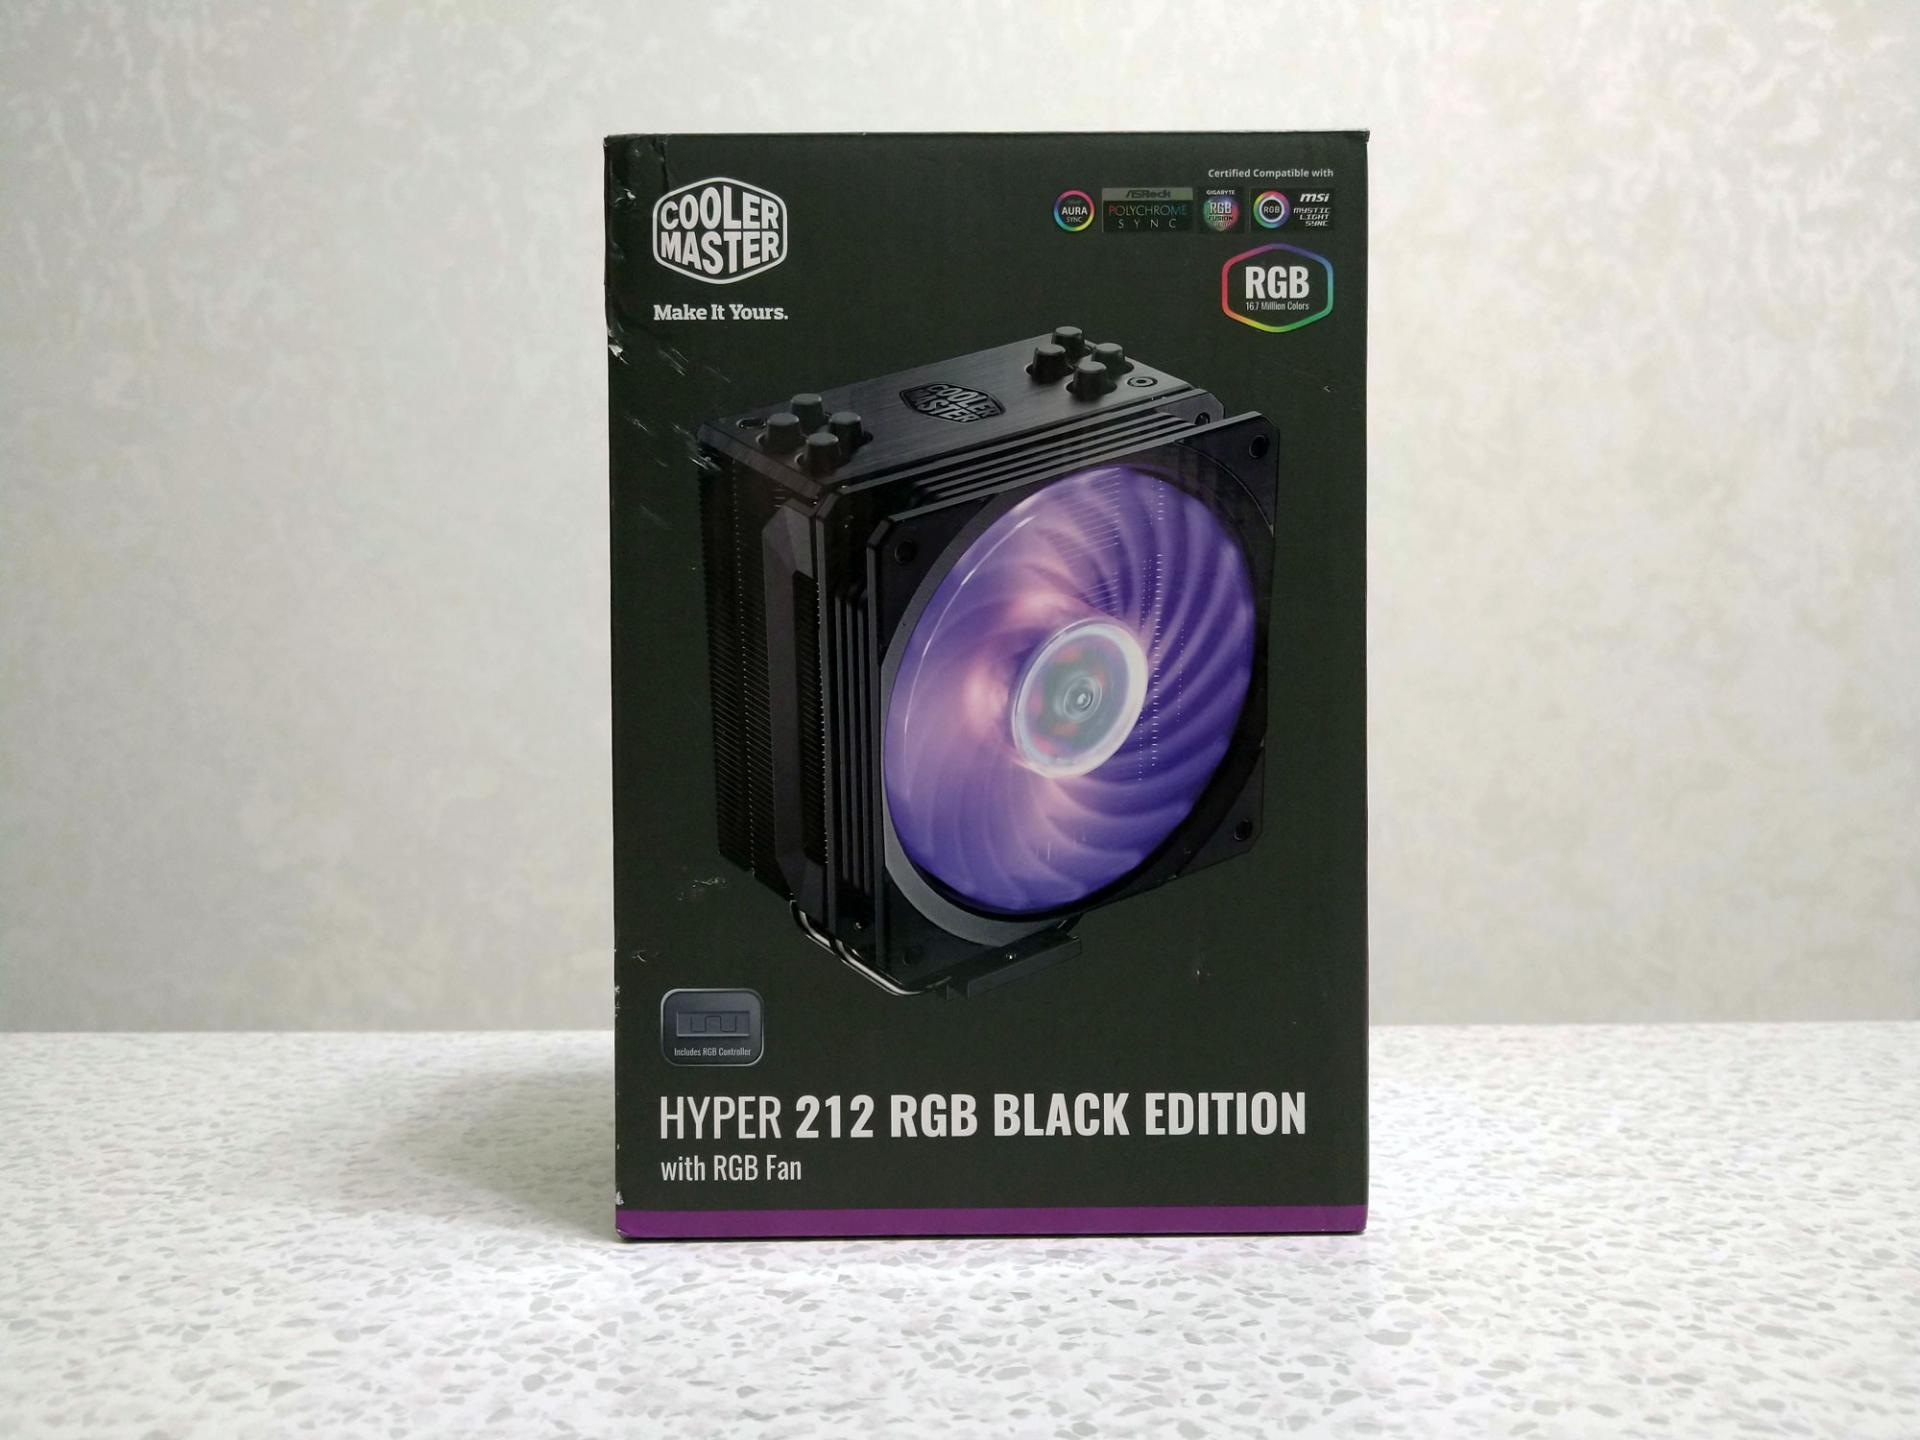 Обзор кулера Cooler Master Hyper 212 RGB Black Edition: заметно охладил иускорил Intel Core i5-8500